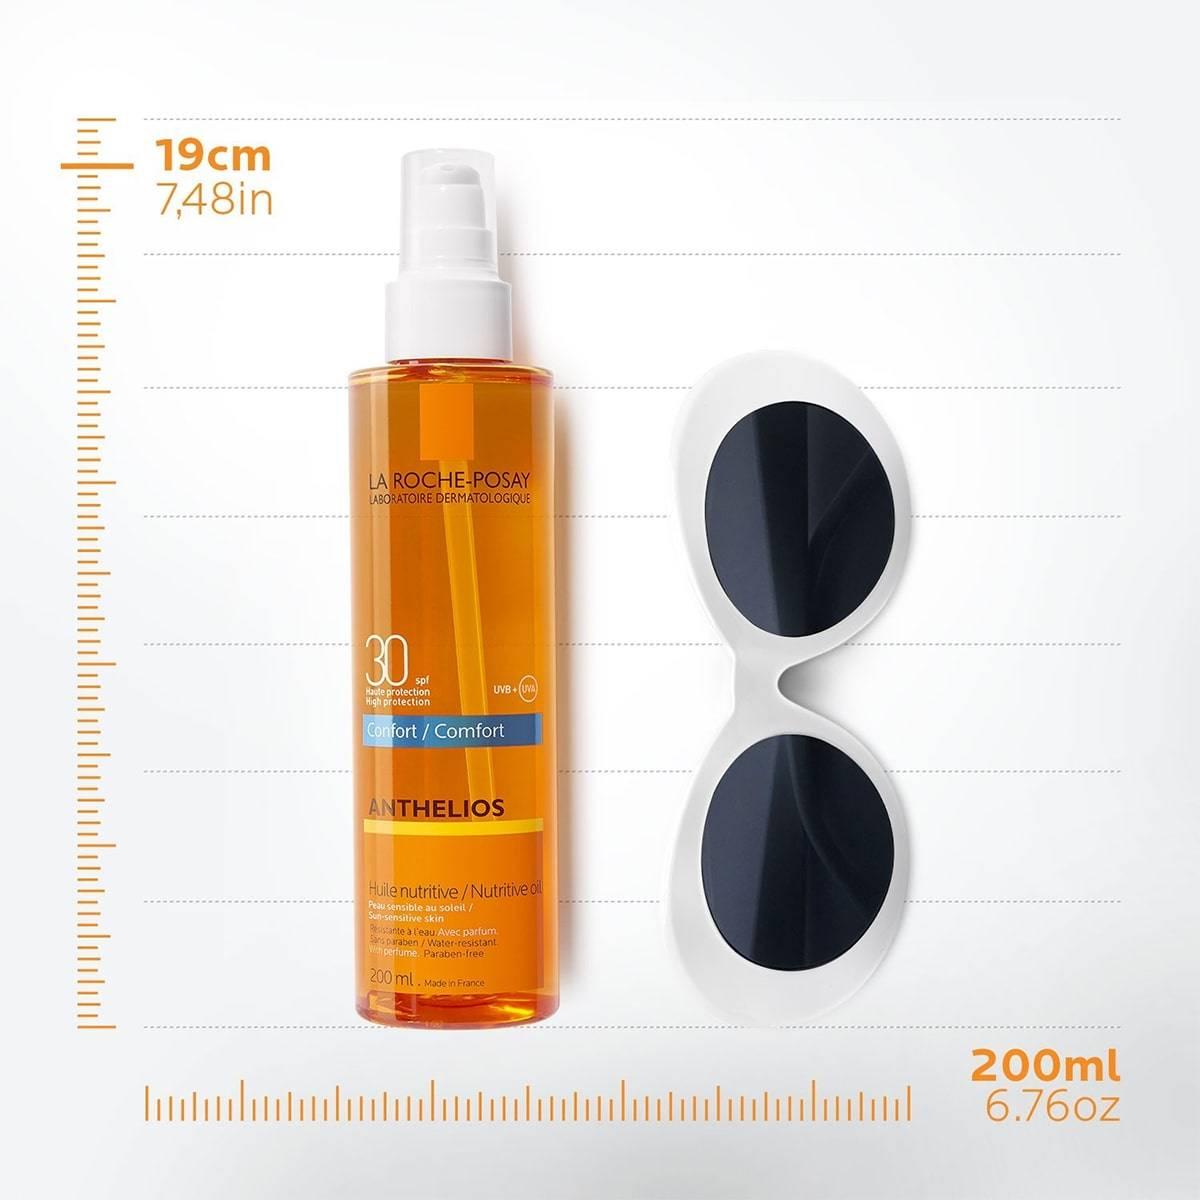 La Roche Posay ProductPage Sun Anthelios Nutritive Oil Comfort Spf30 2